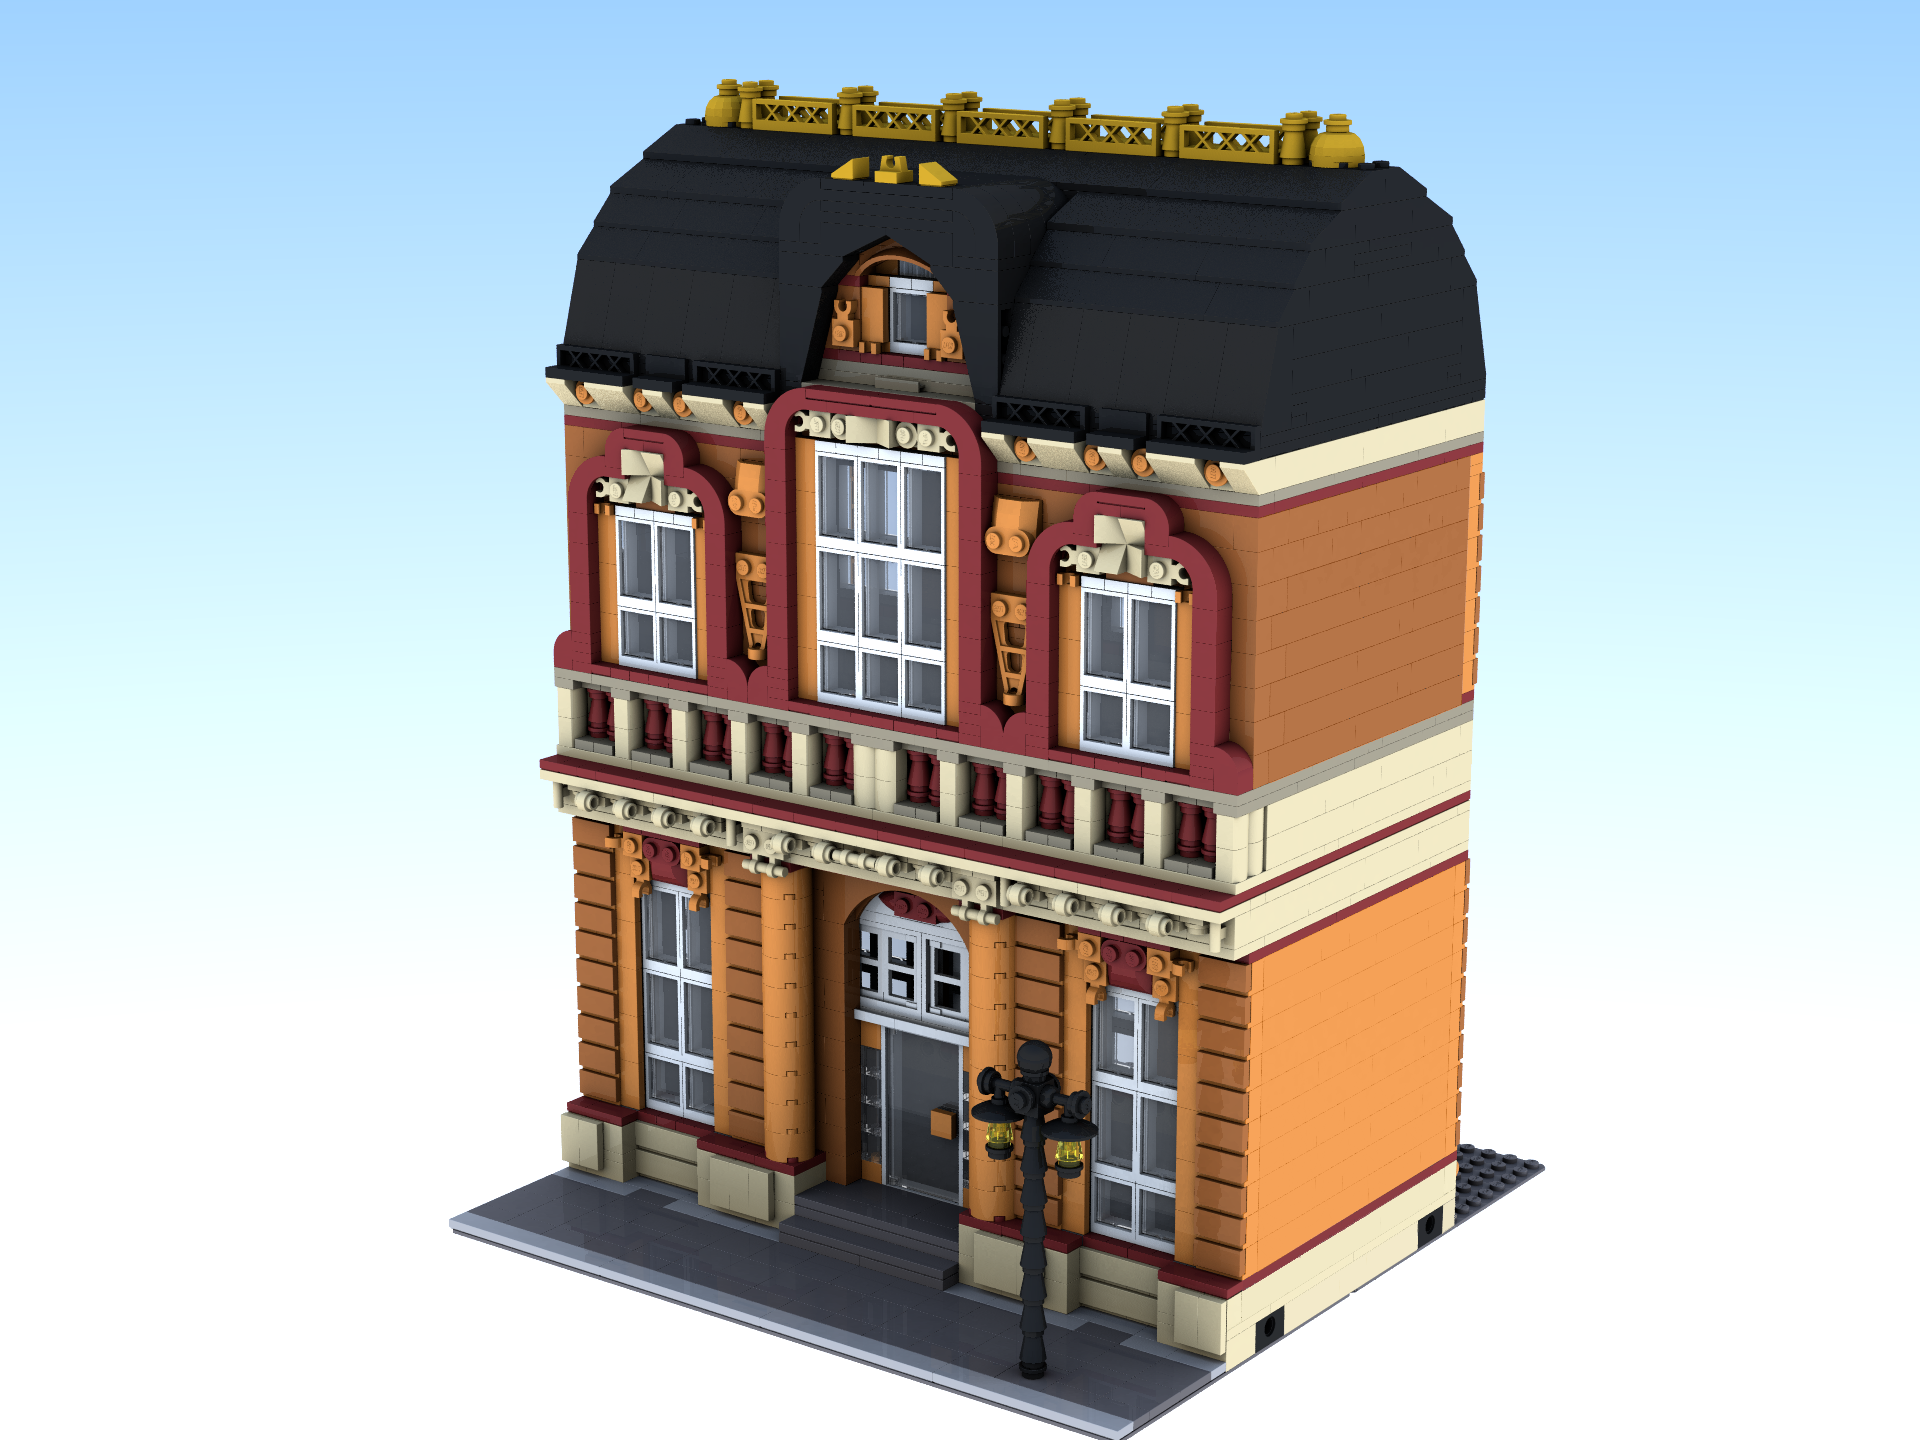 Real Life Lego House 130 Best Lego Images On Pinterest Lego Architecture Legos And